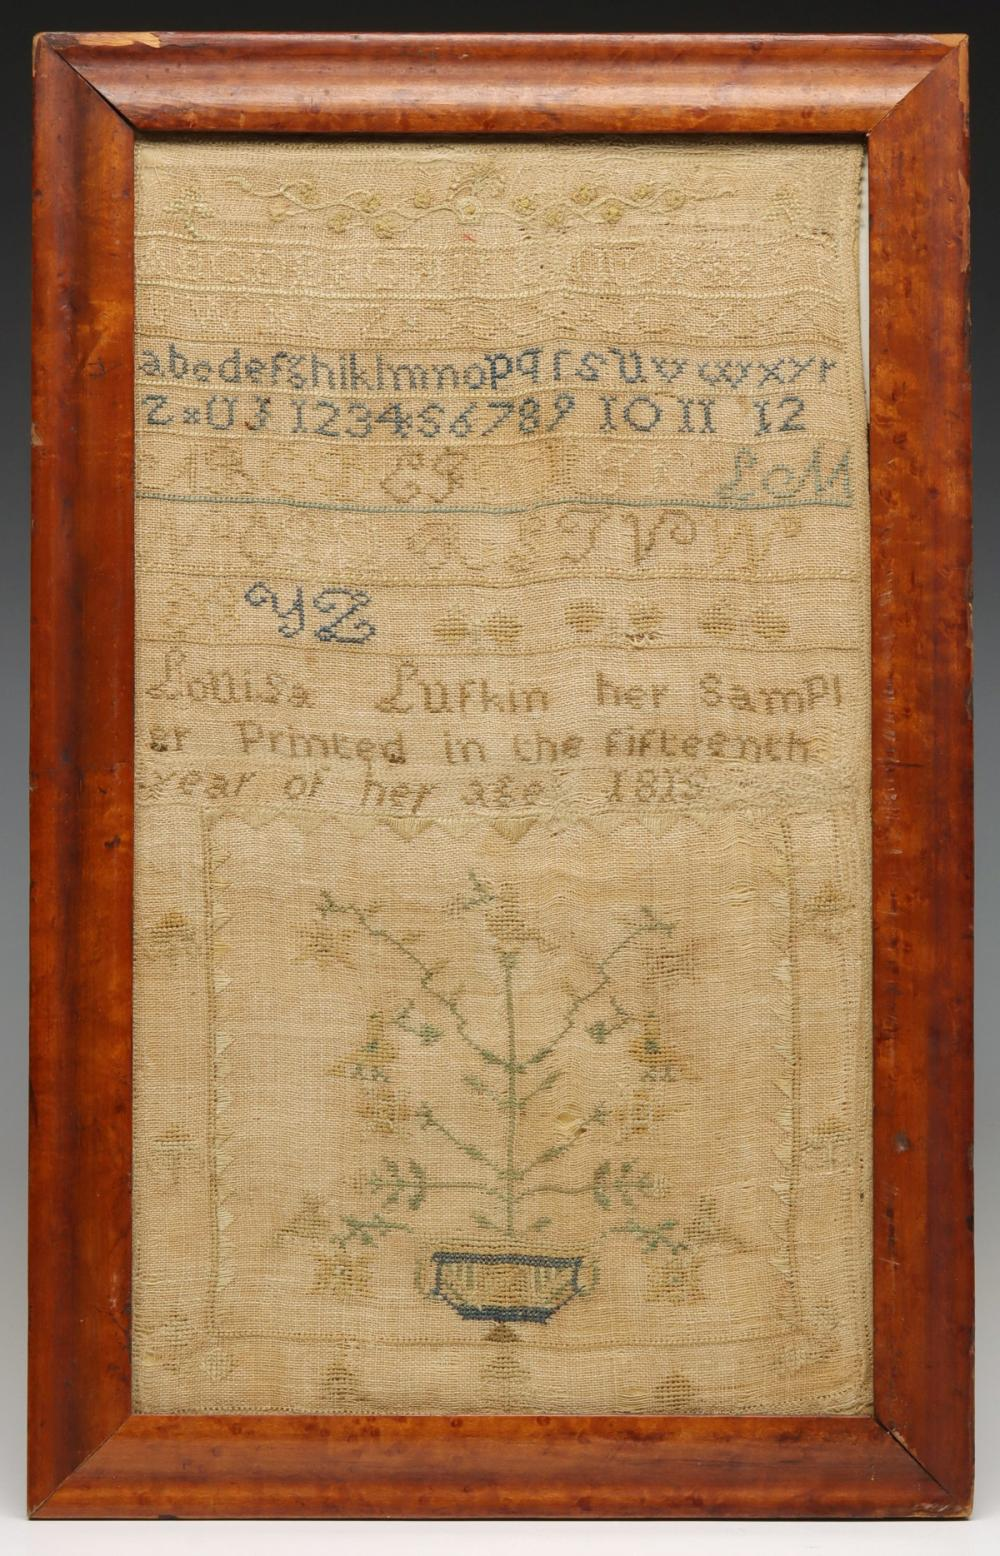 THE 1819 CROSS STITCH SAMPLER OF LOUISA LUFKIN, AGE 15